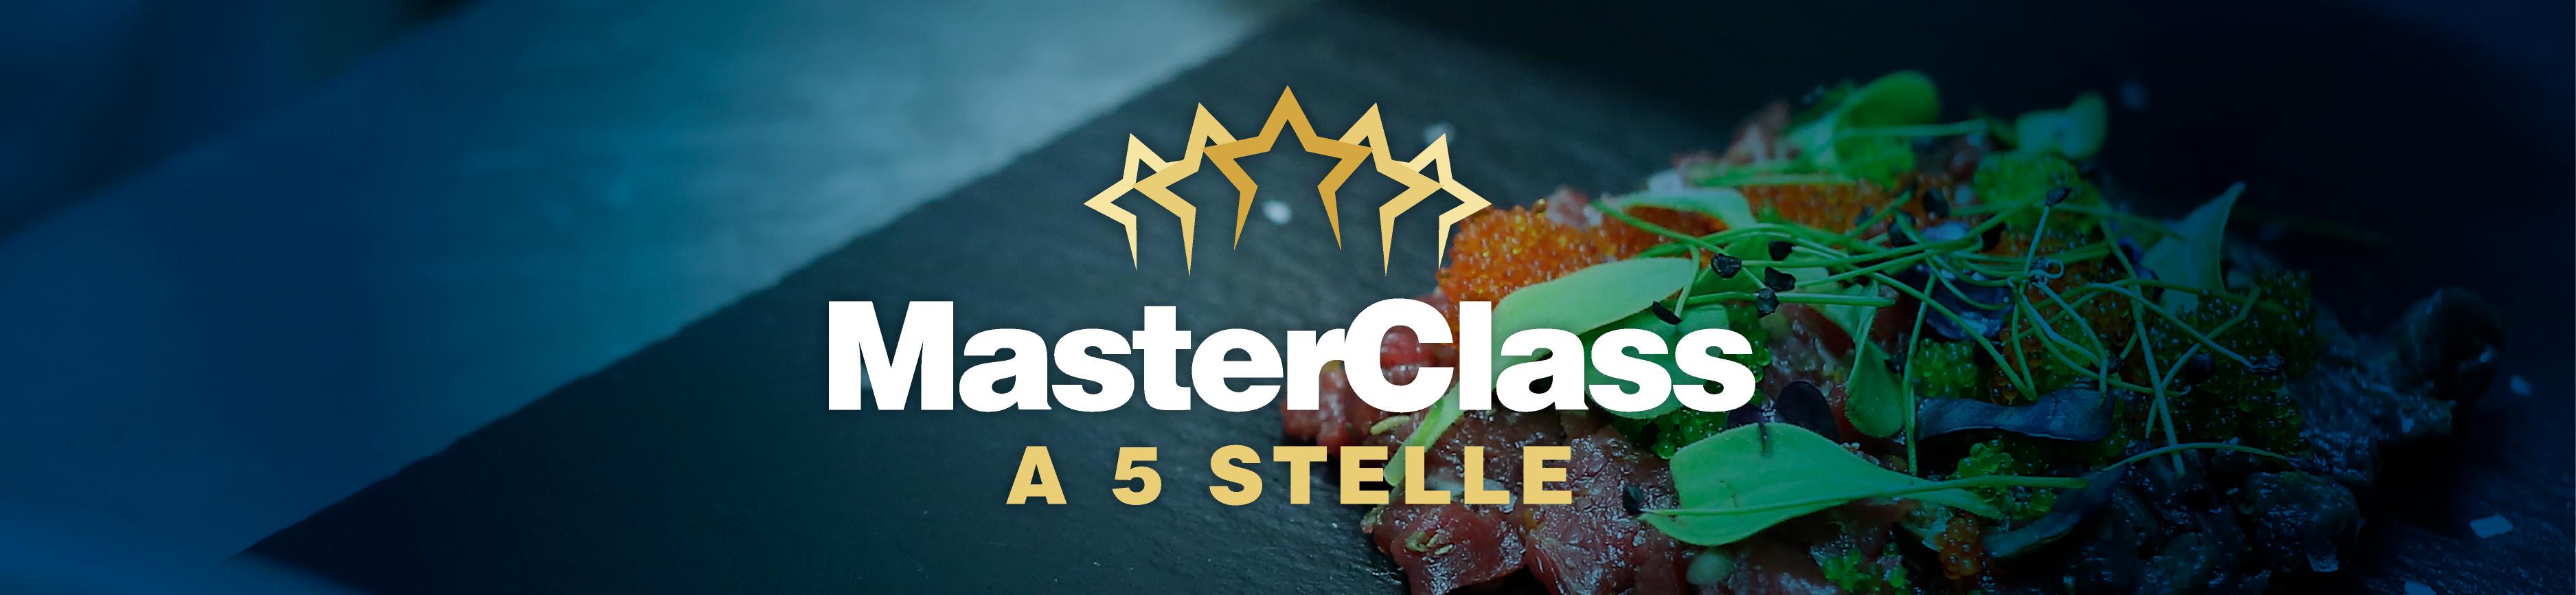 costruire-logo-masterclass5stelle